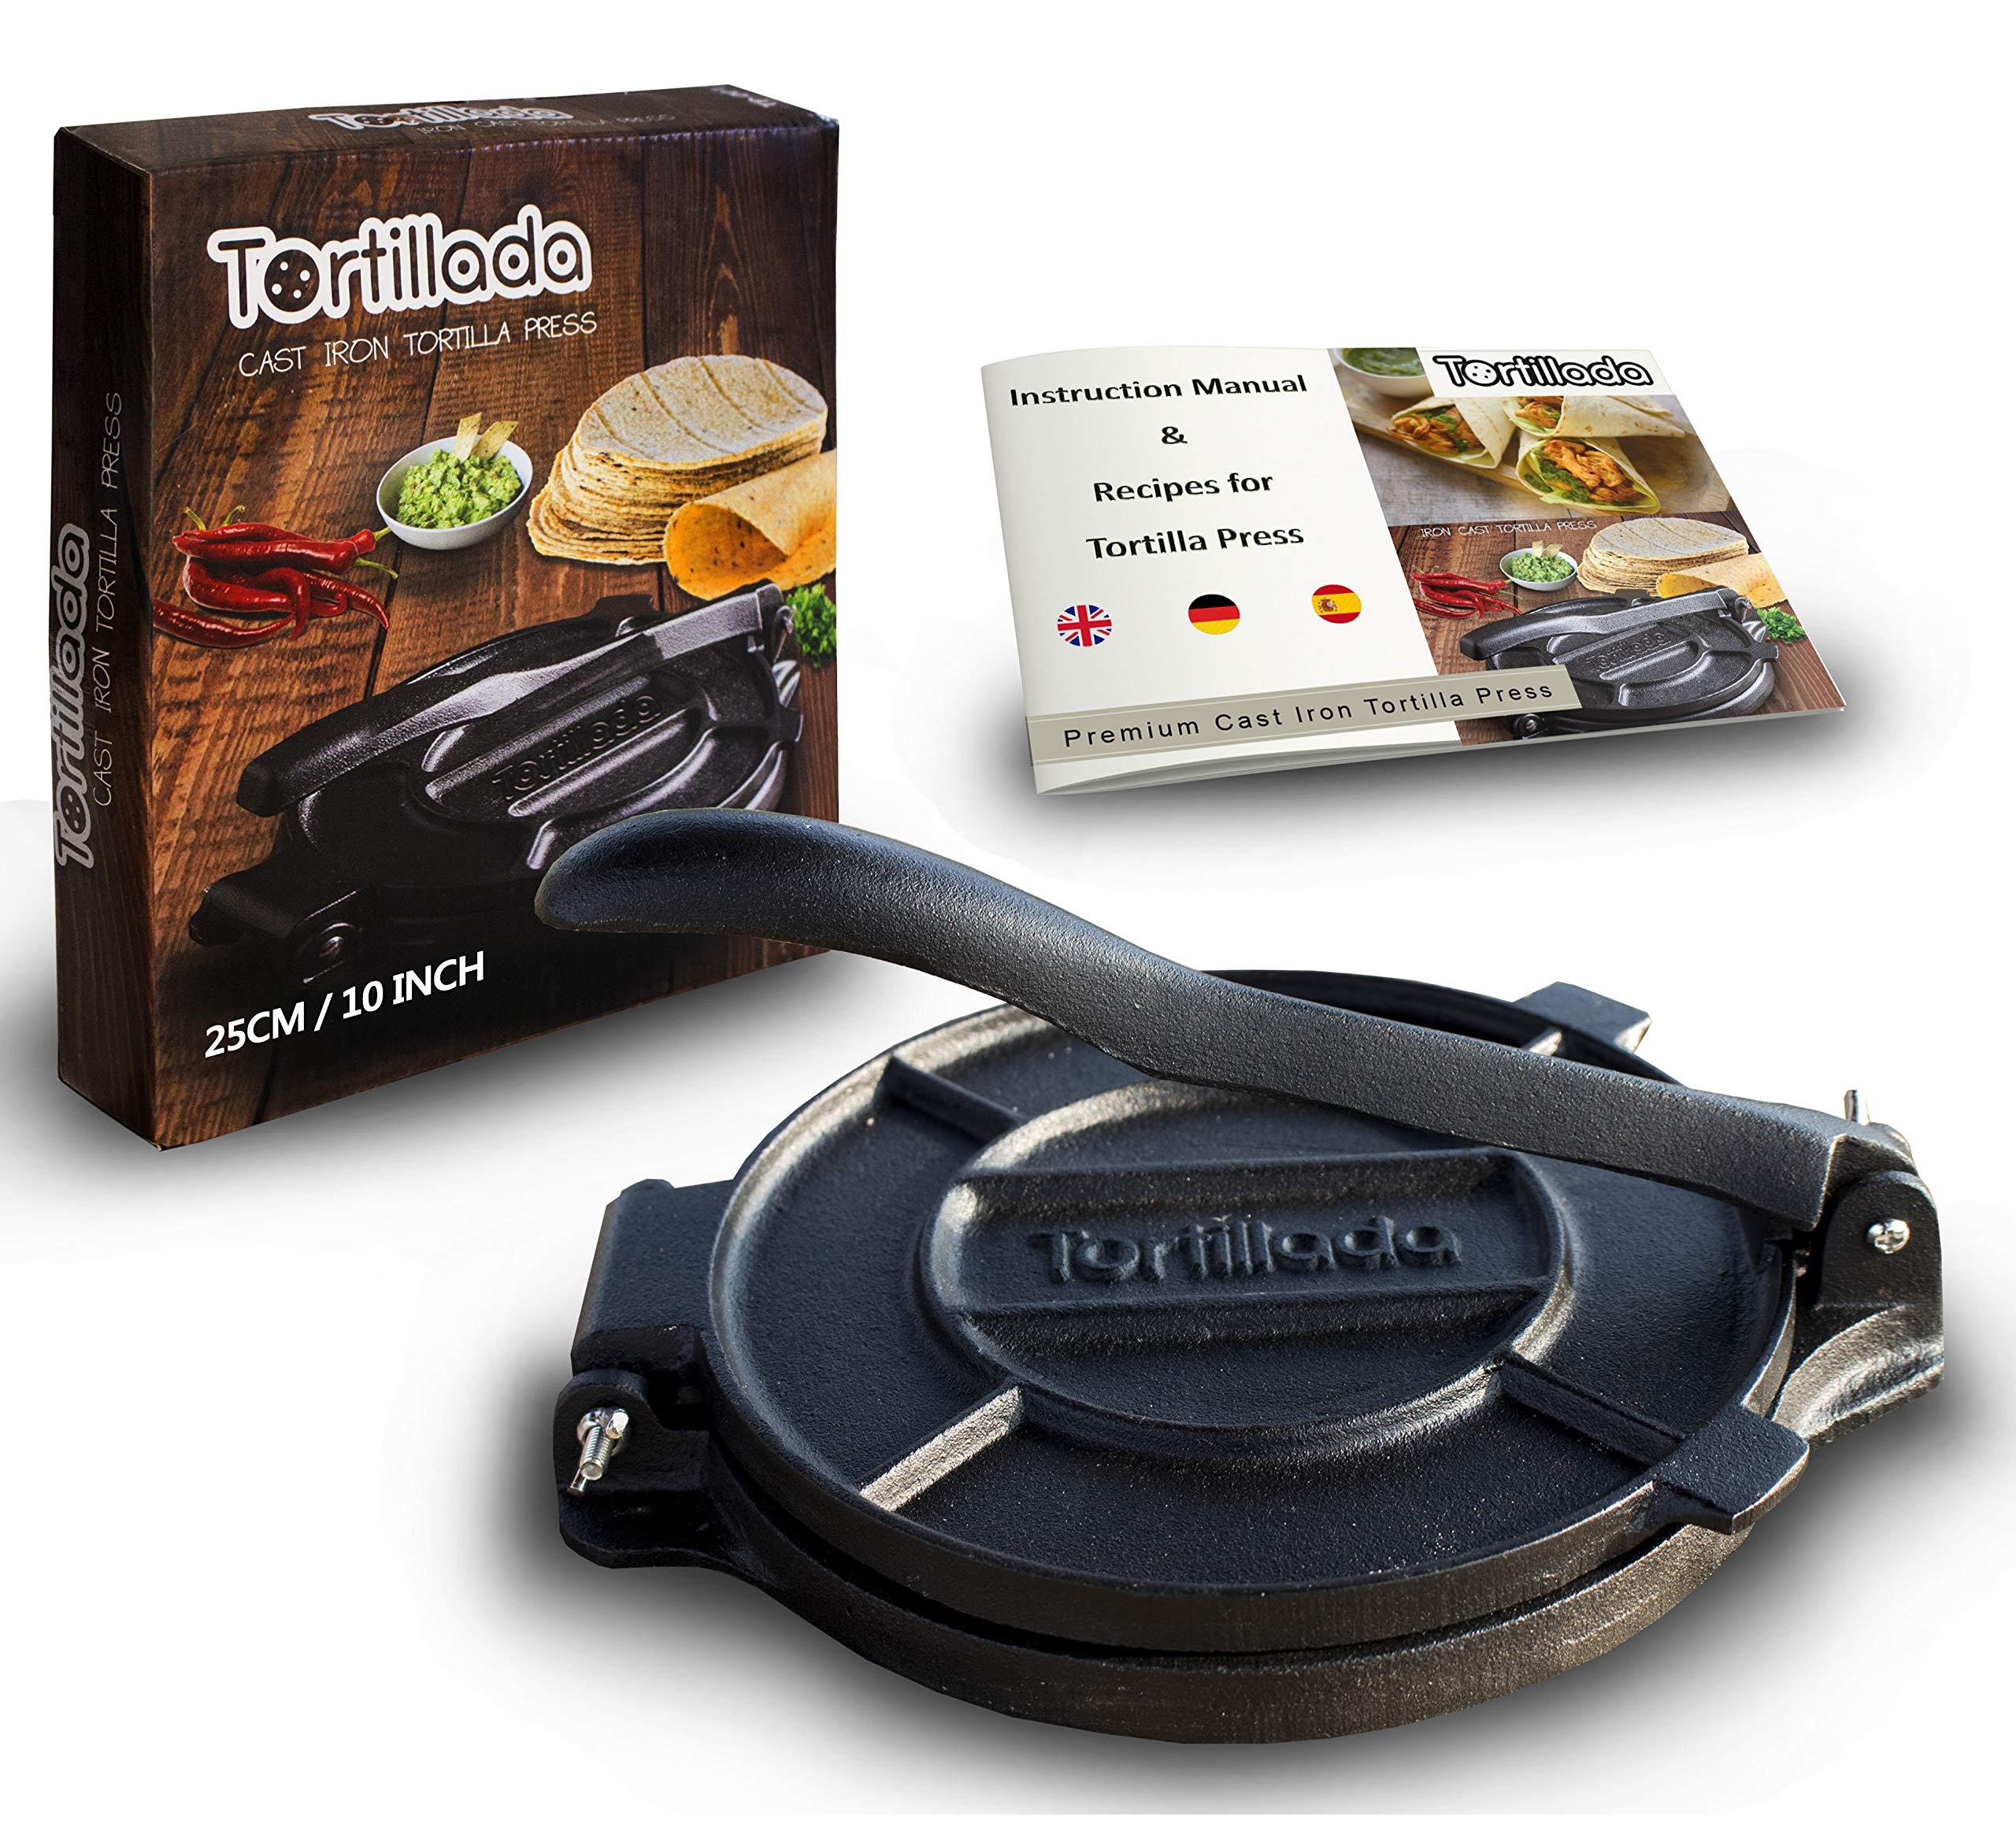 Tortillada - Premium Cast Iron Tortilla Press with Recipes (10 Inch) / Biggest Tortilla Press in the Market by Tortillada